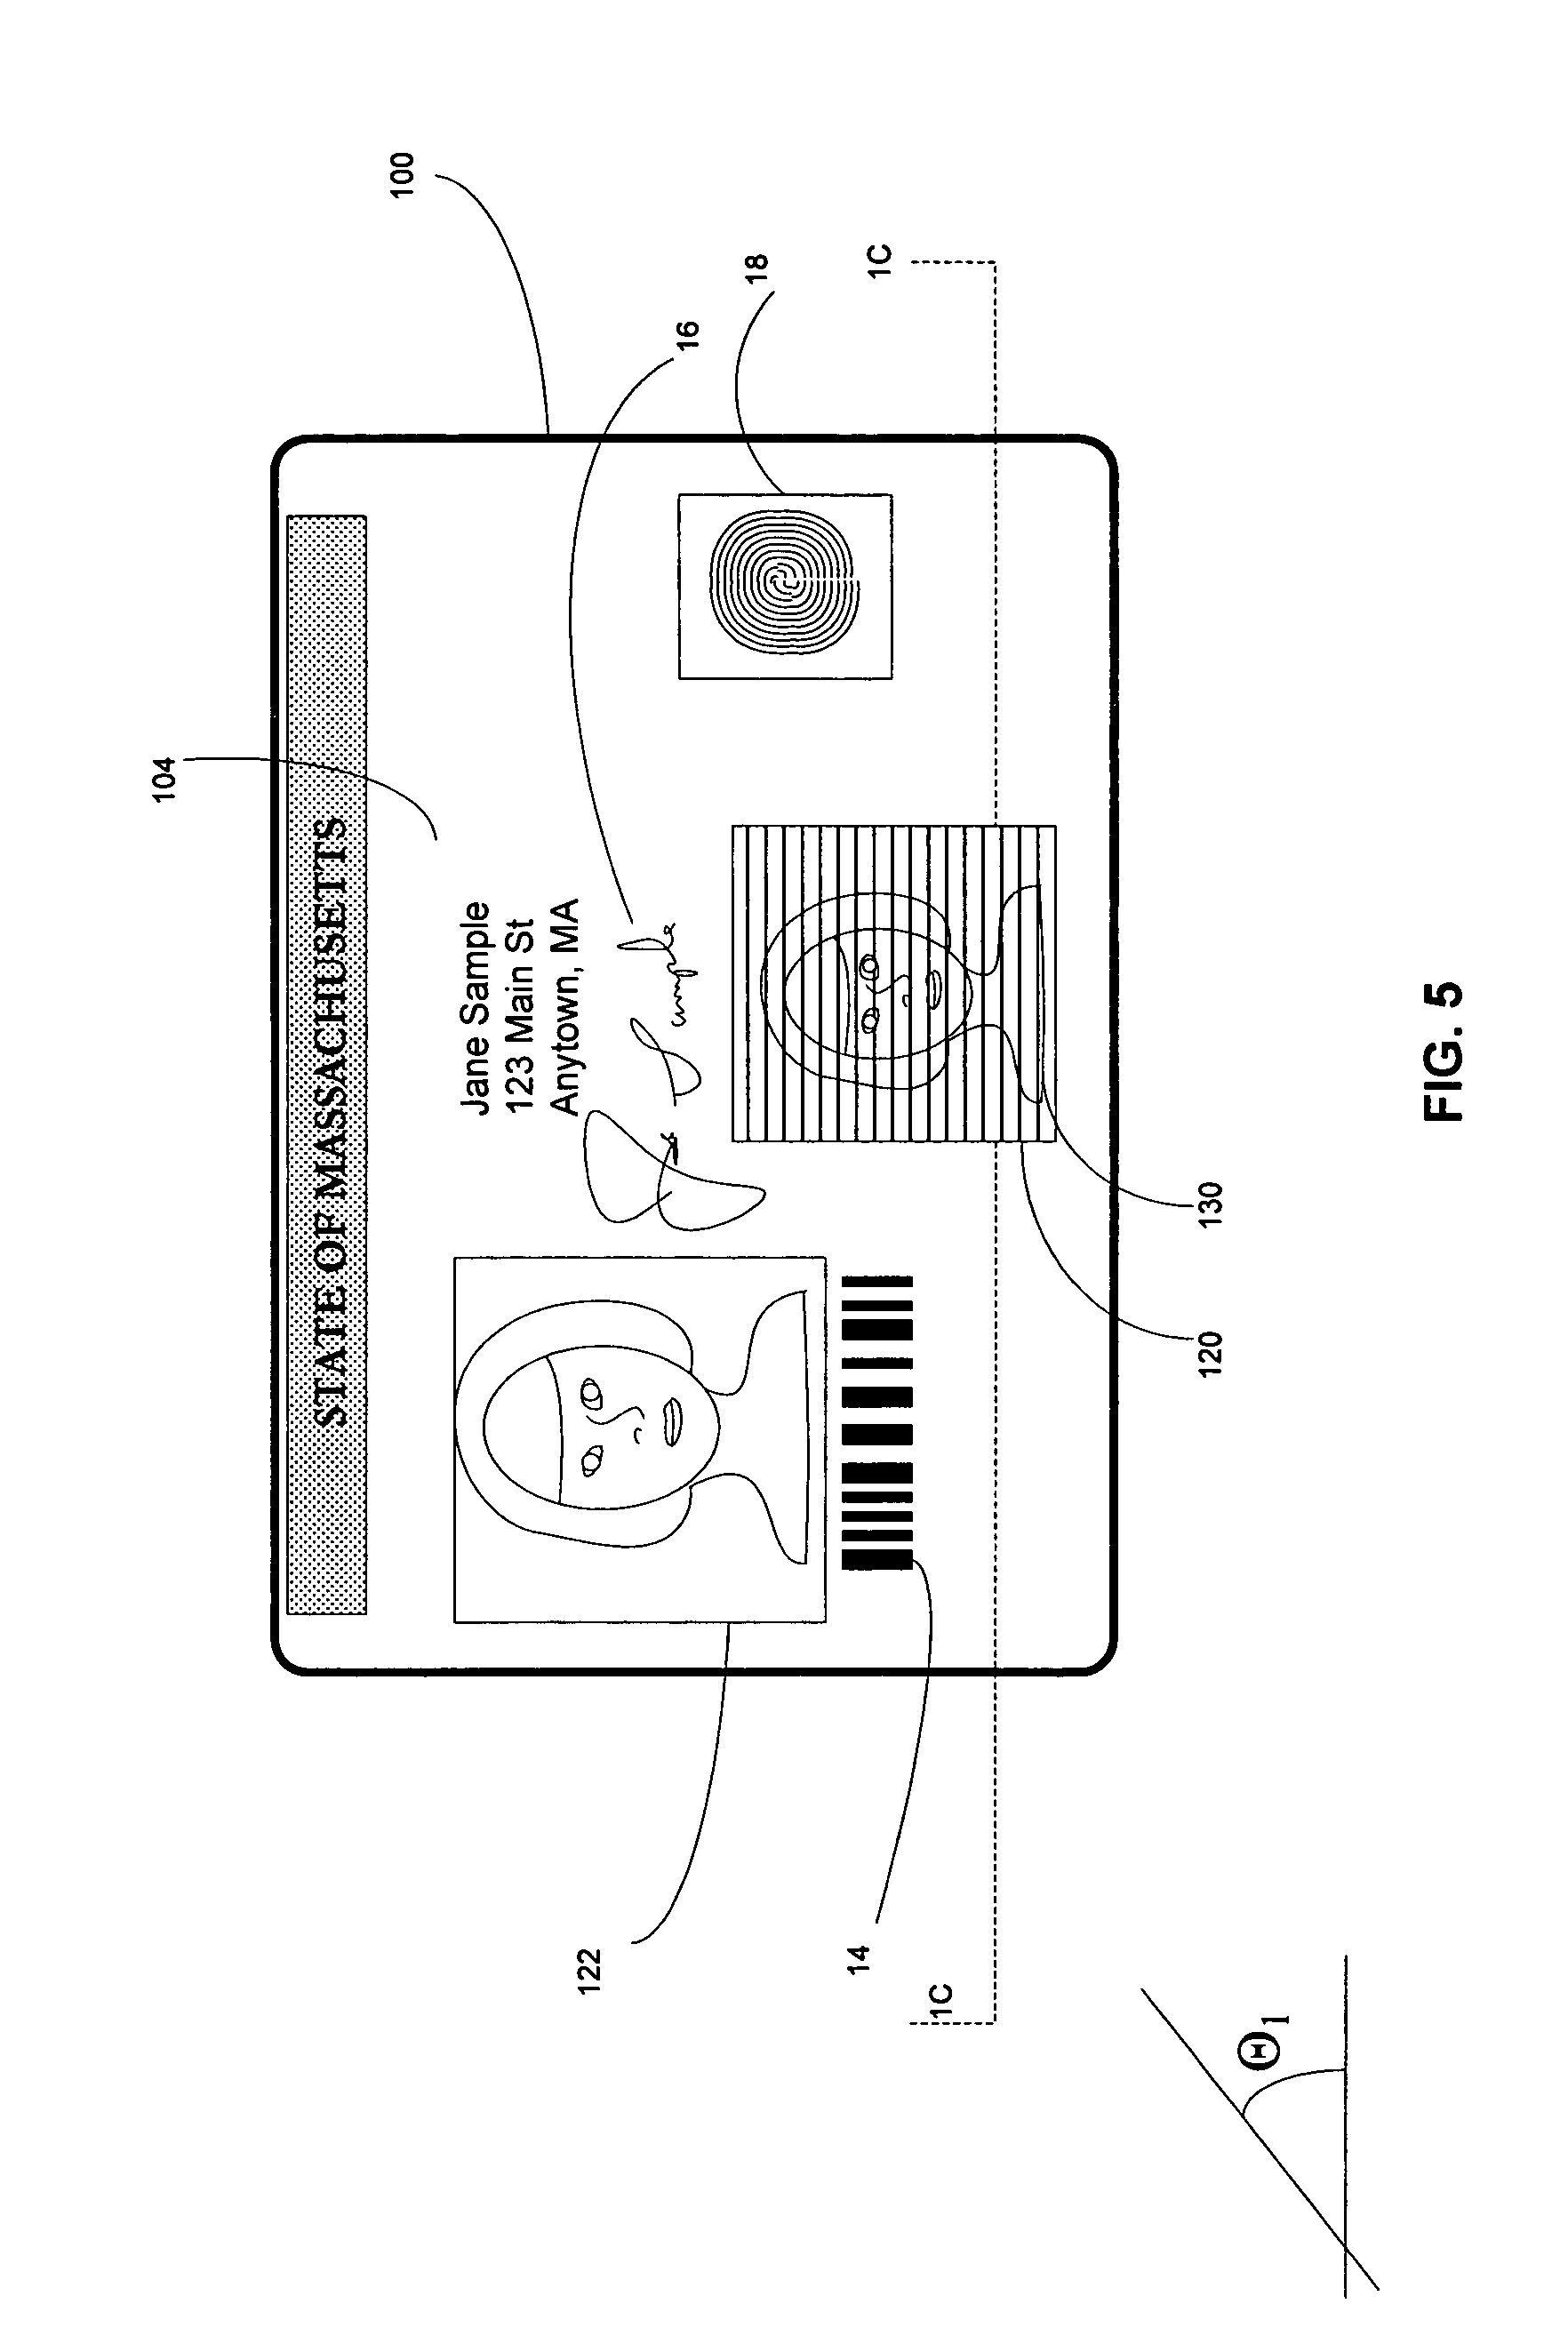 Patent US 7,744,001 B2